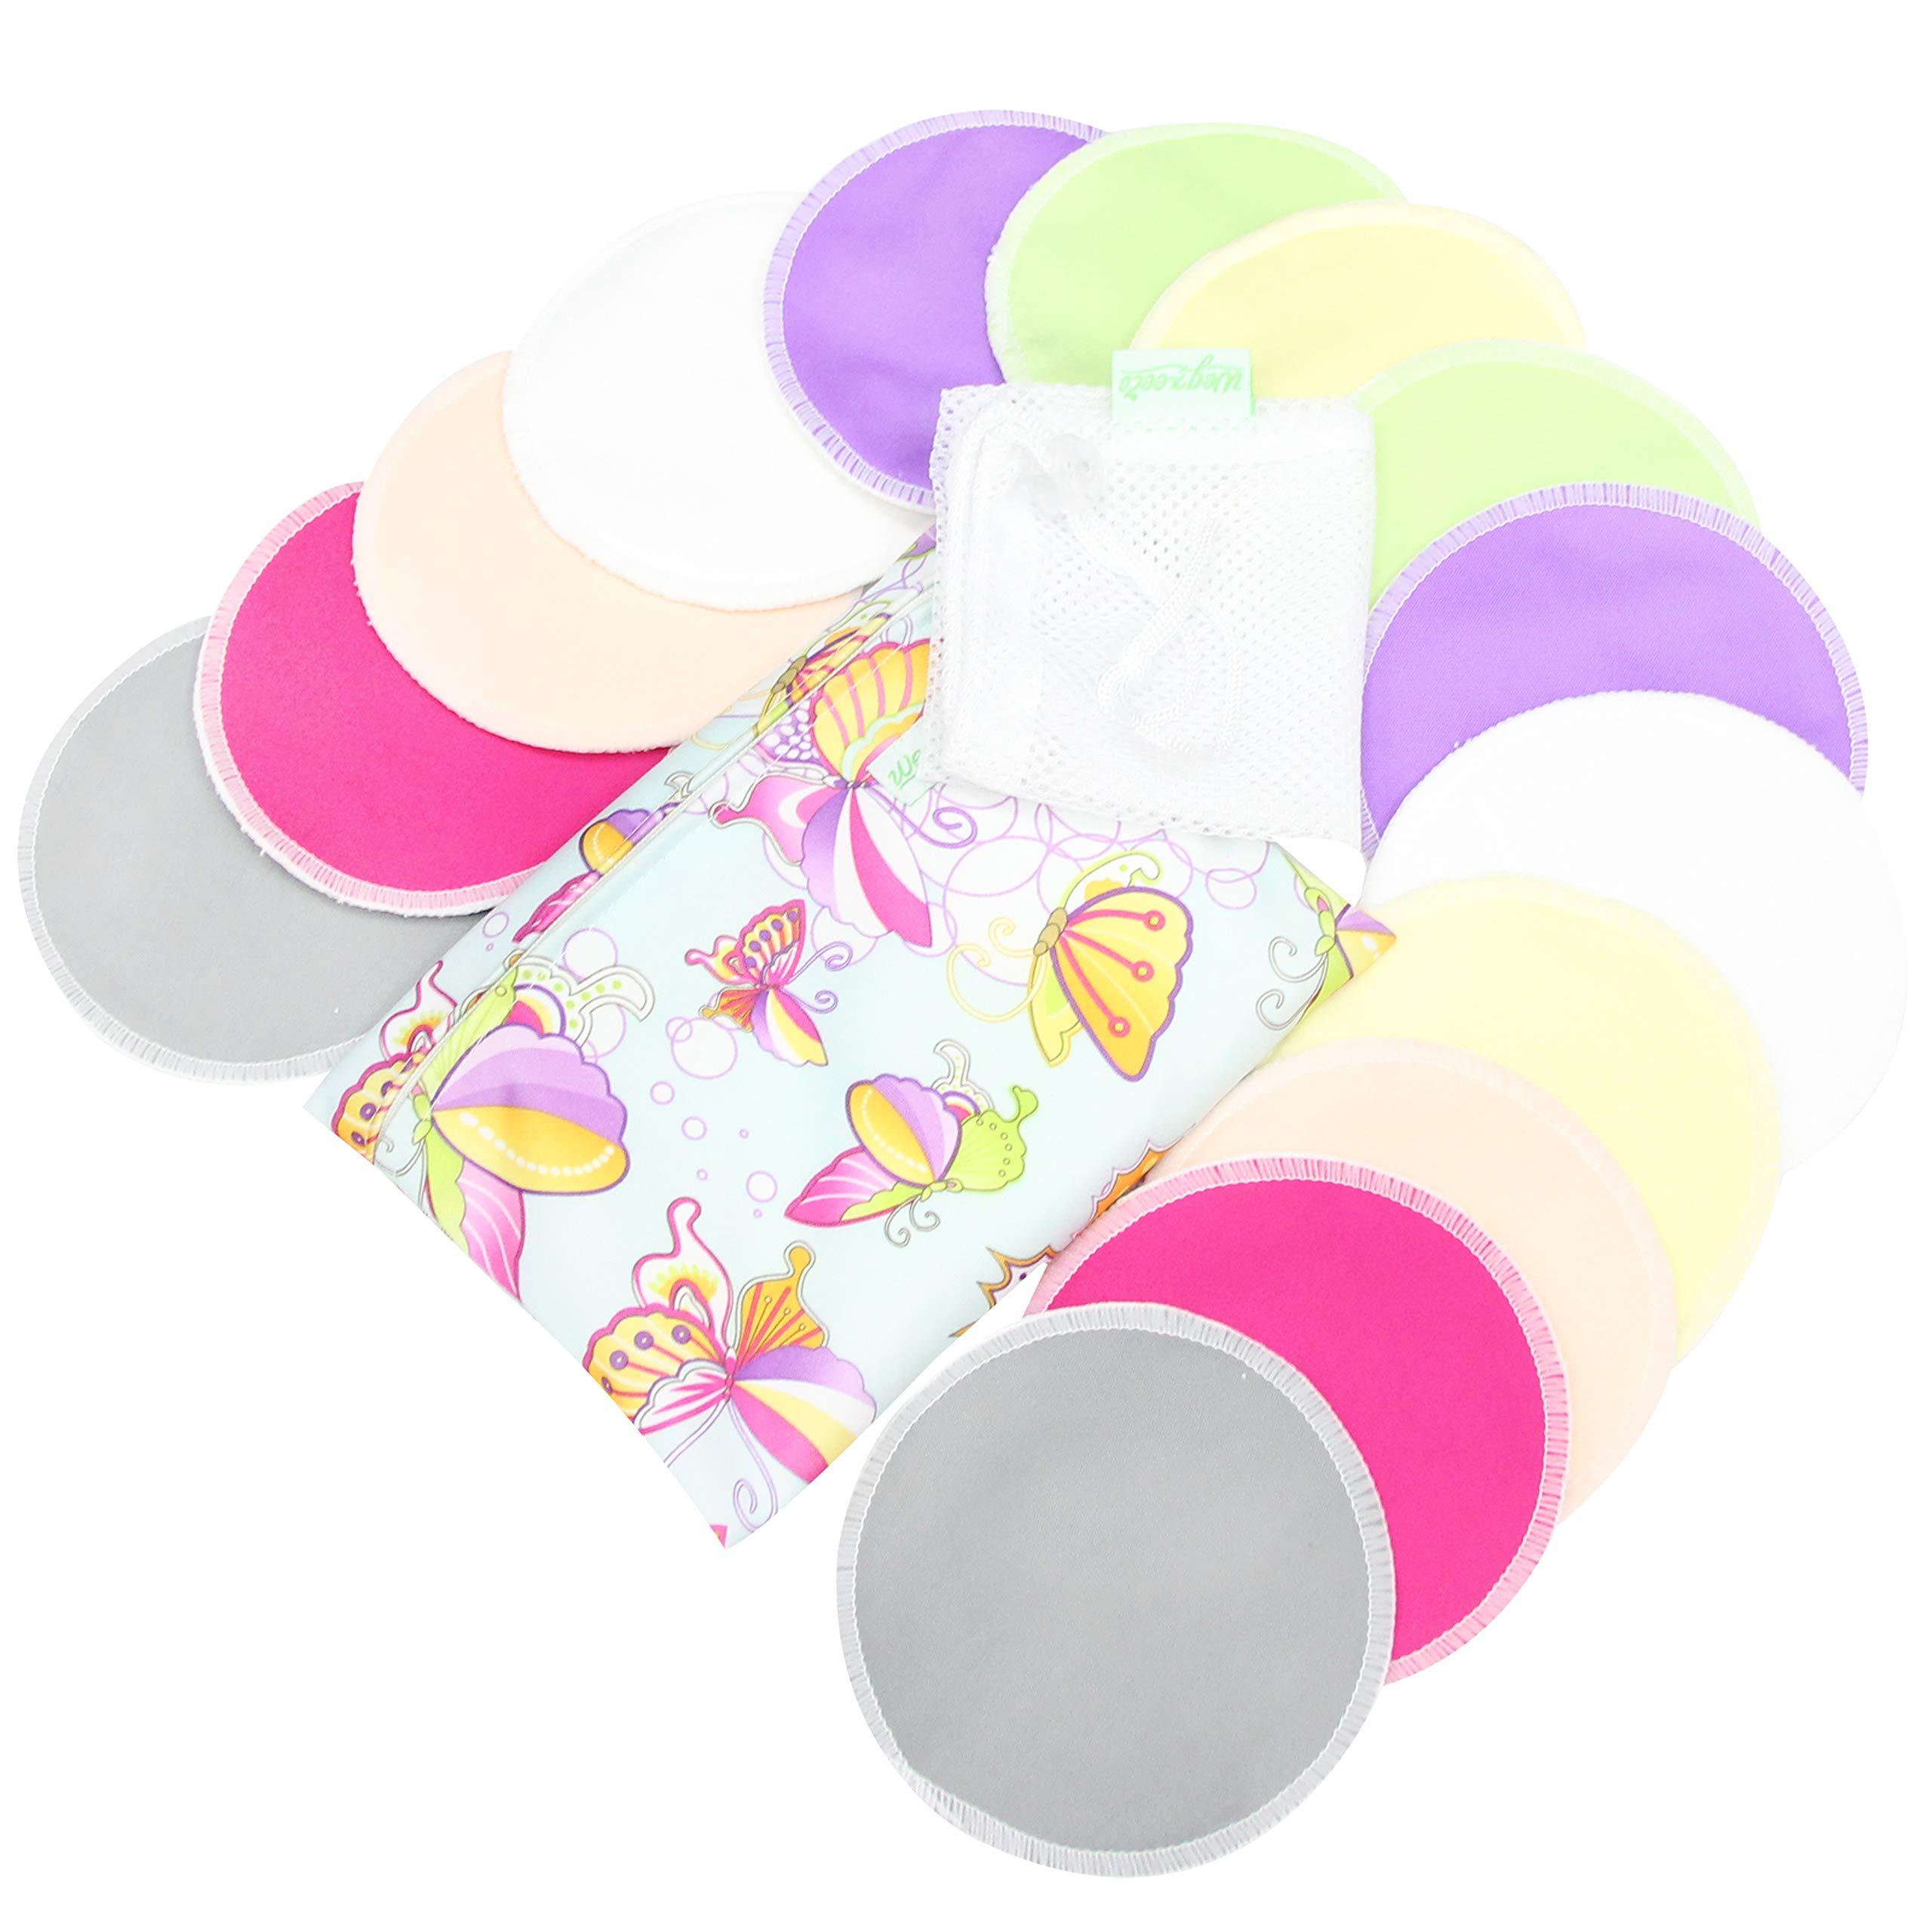 Bamboo Nursing Pads (14 Pack)+Laundry Bag & Travel Bag,2 Sizes:3.9/4.7inch Option - Washable & Reusable Nursing Pads(Passion, Large, Daytime Use) by wegreeco